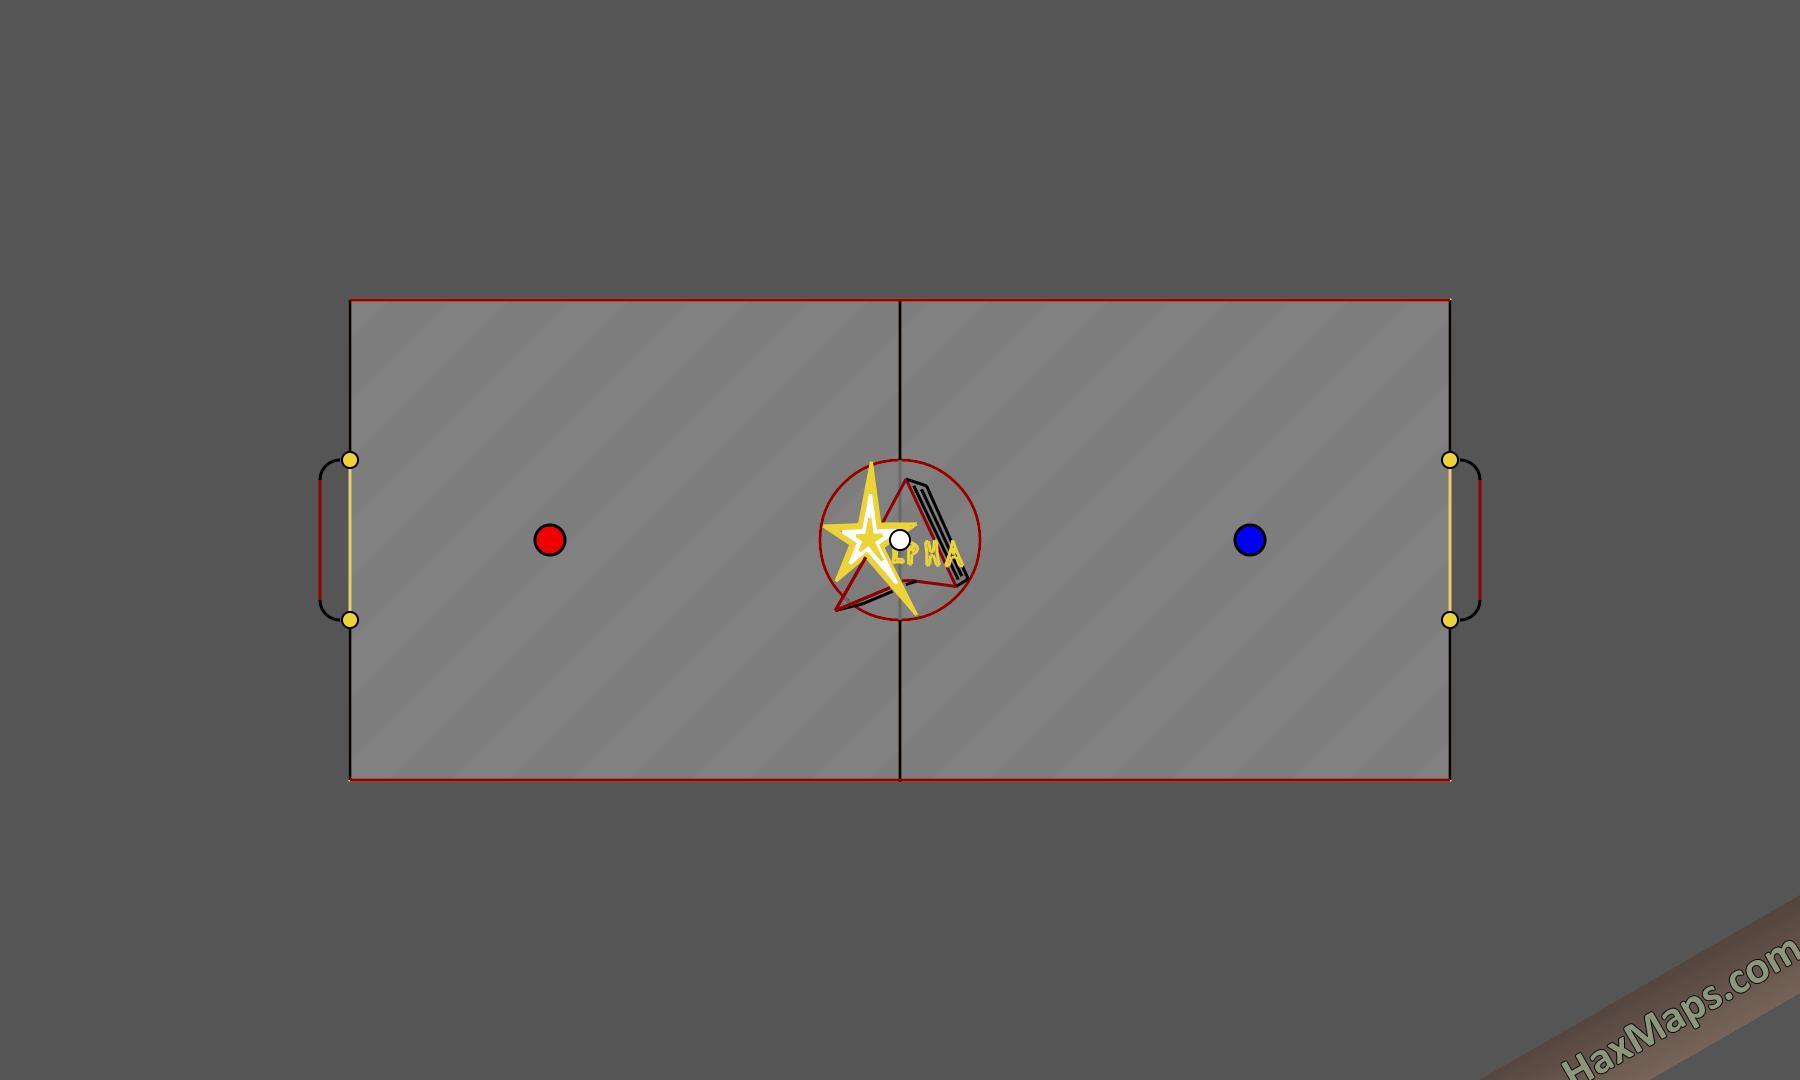 hax ball maps | Buenda Klasik Real Soccer